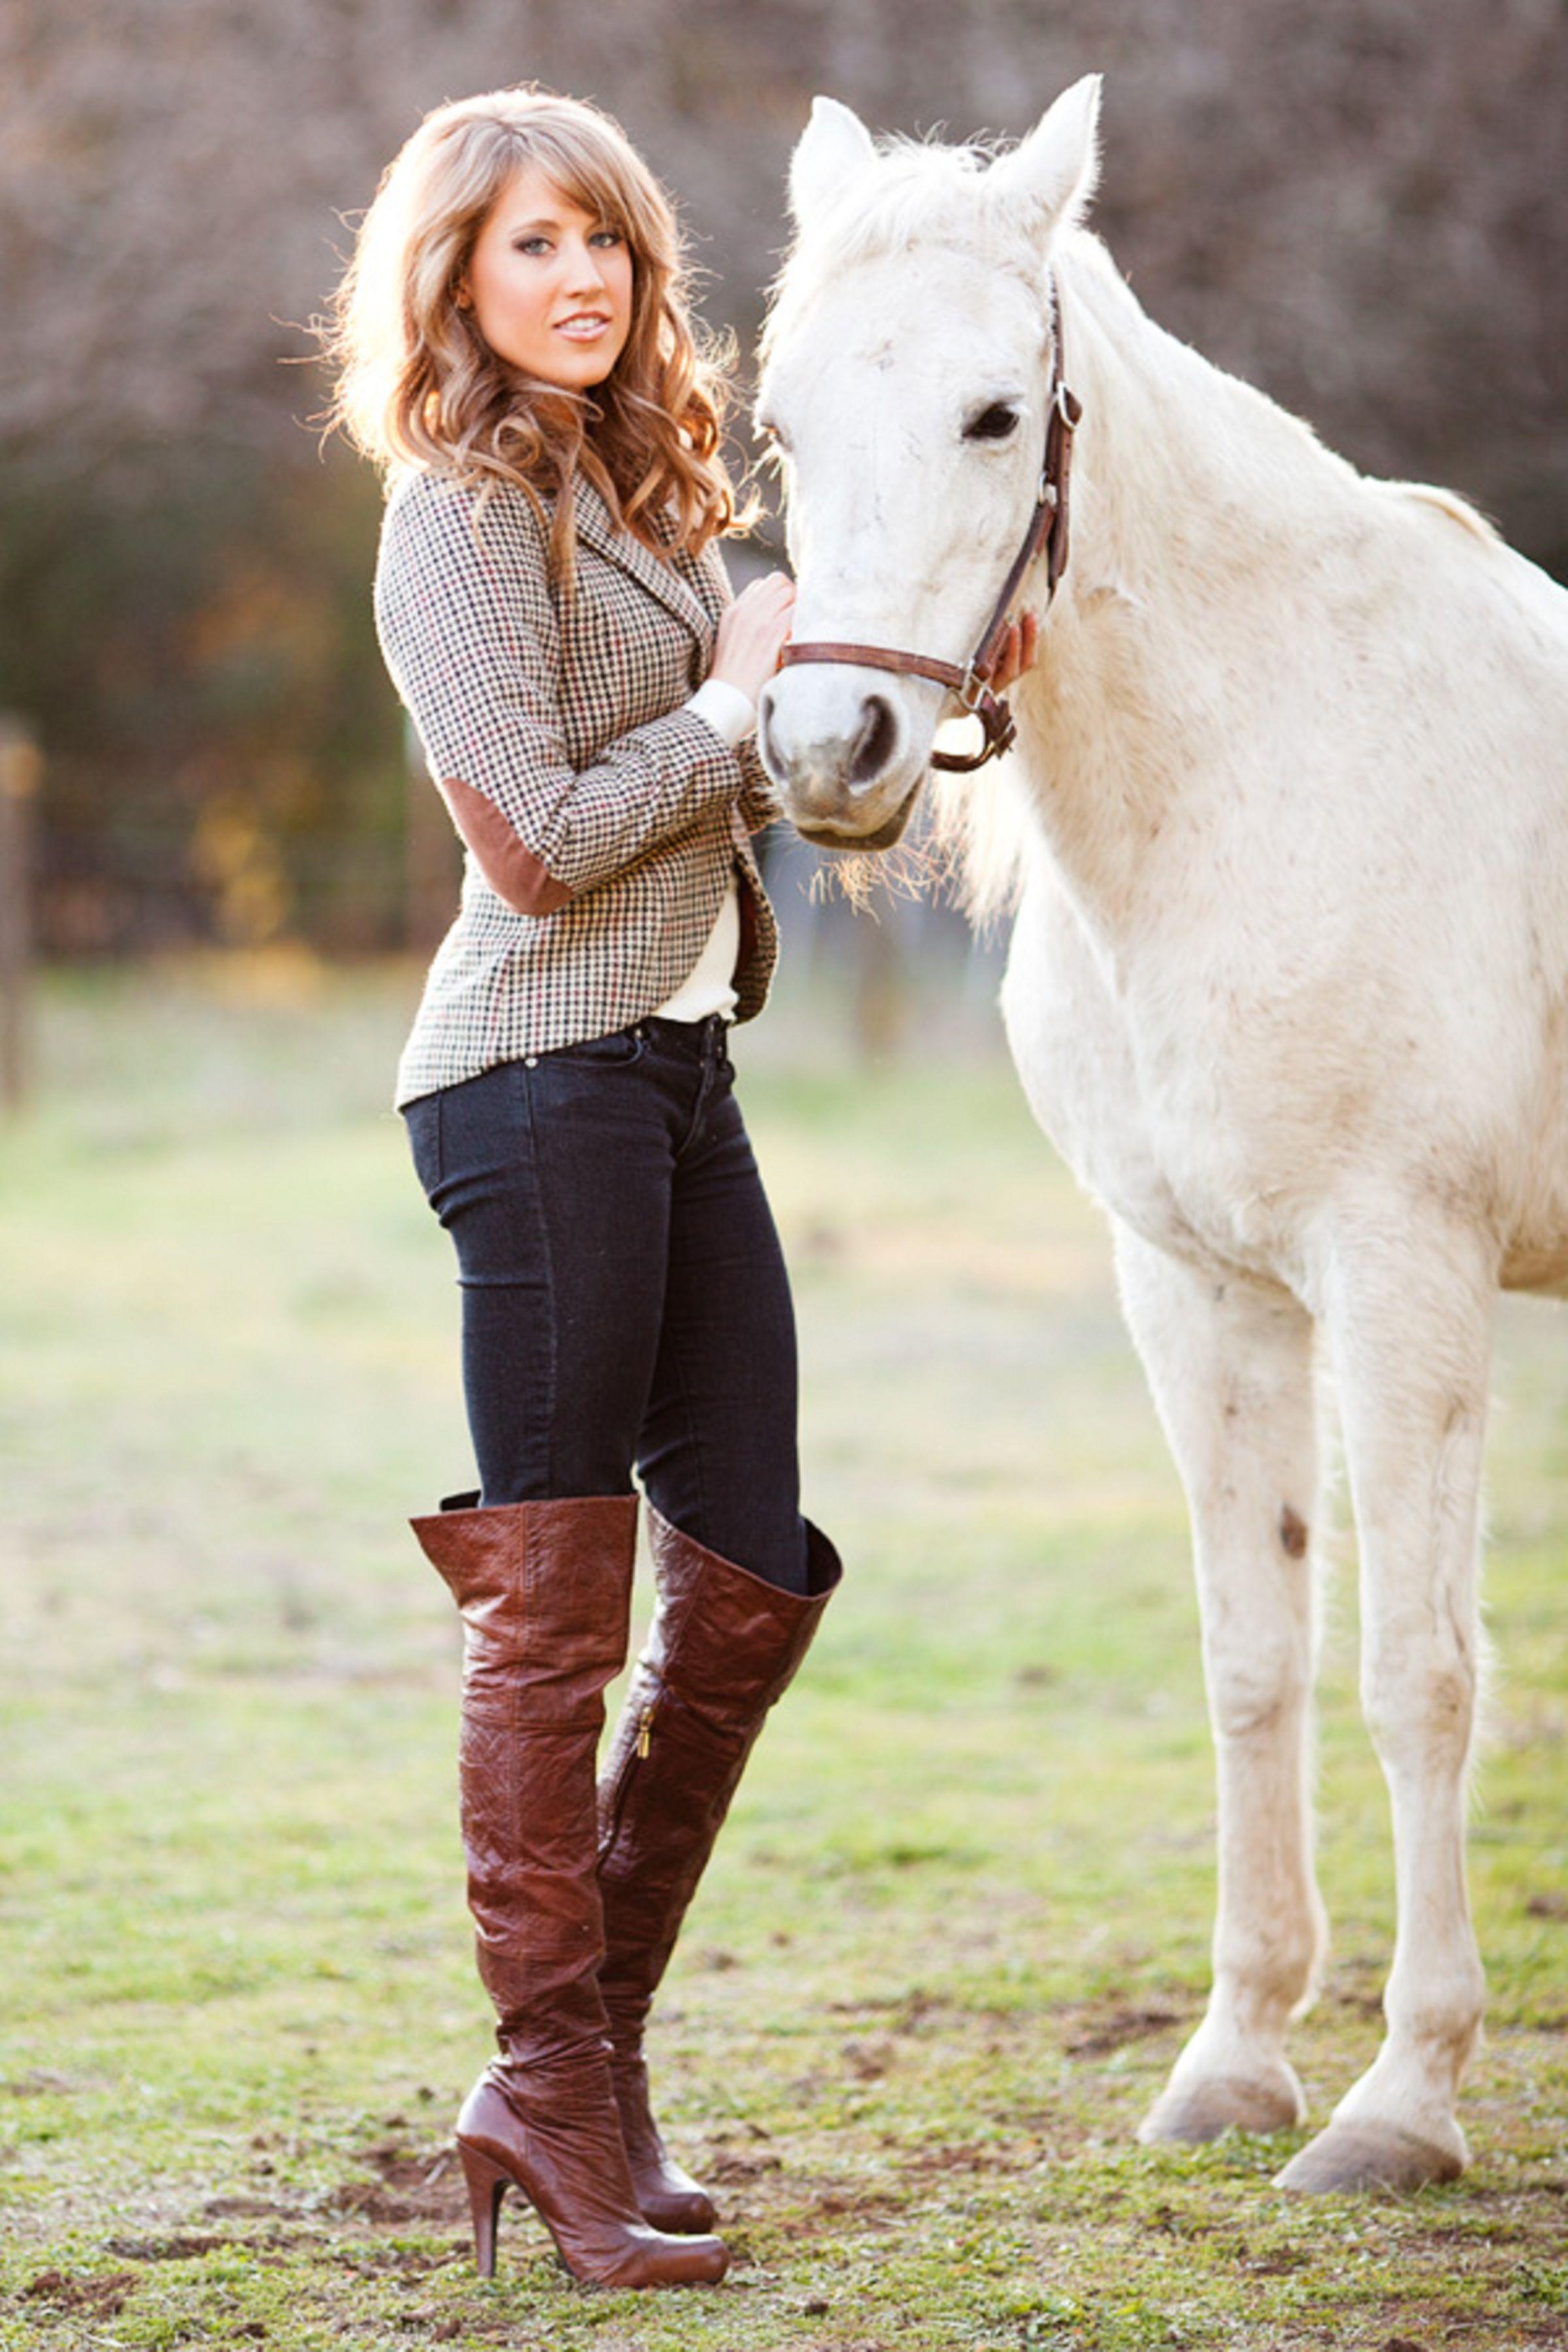 Horse riding fashion boots | Fashion | Pinterest | Horse ...